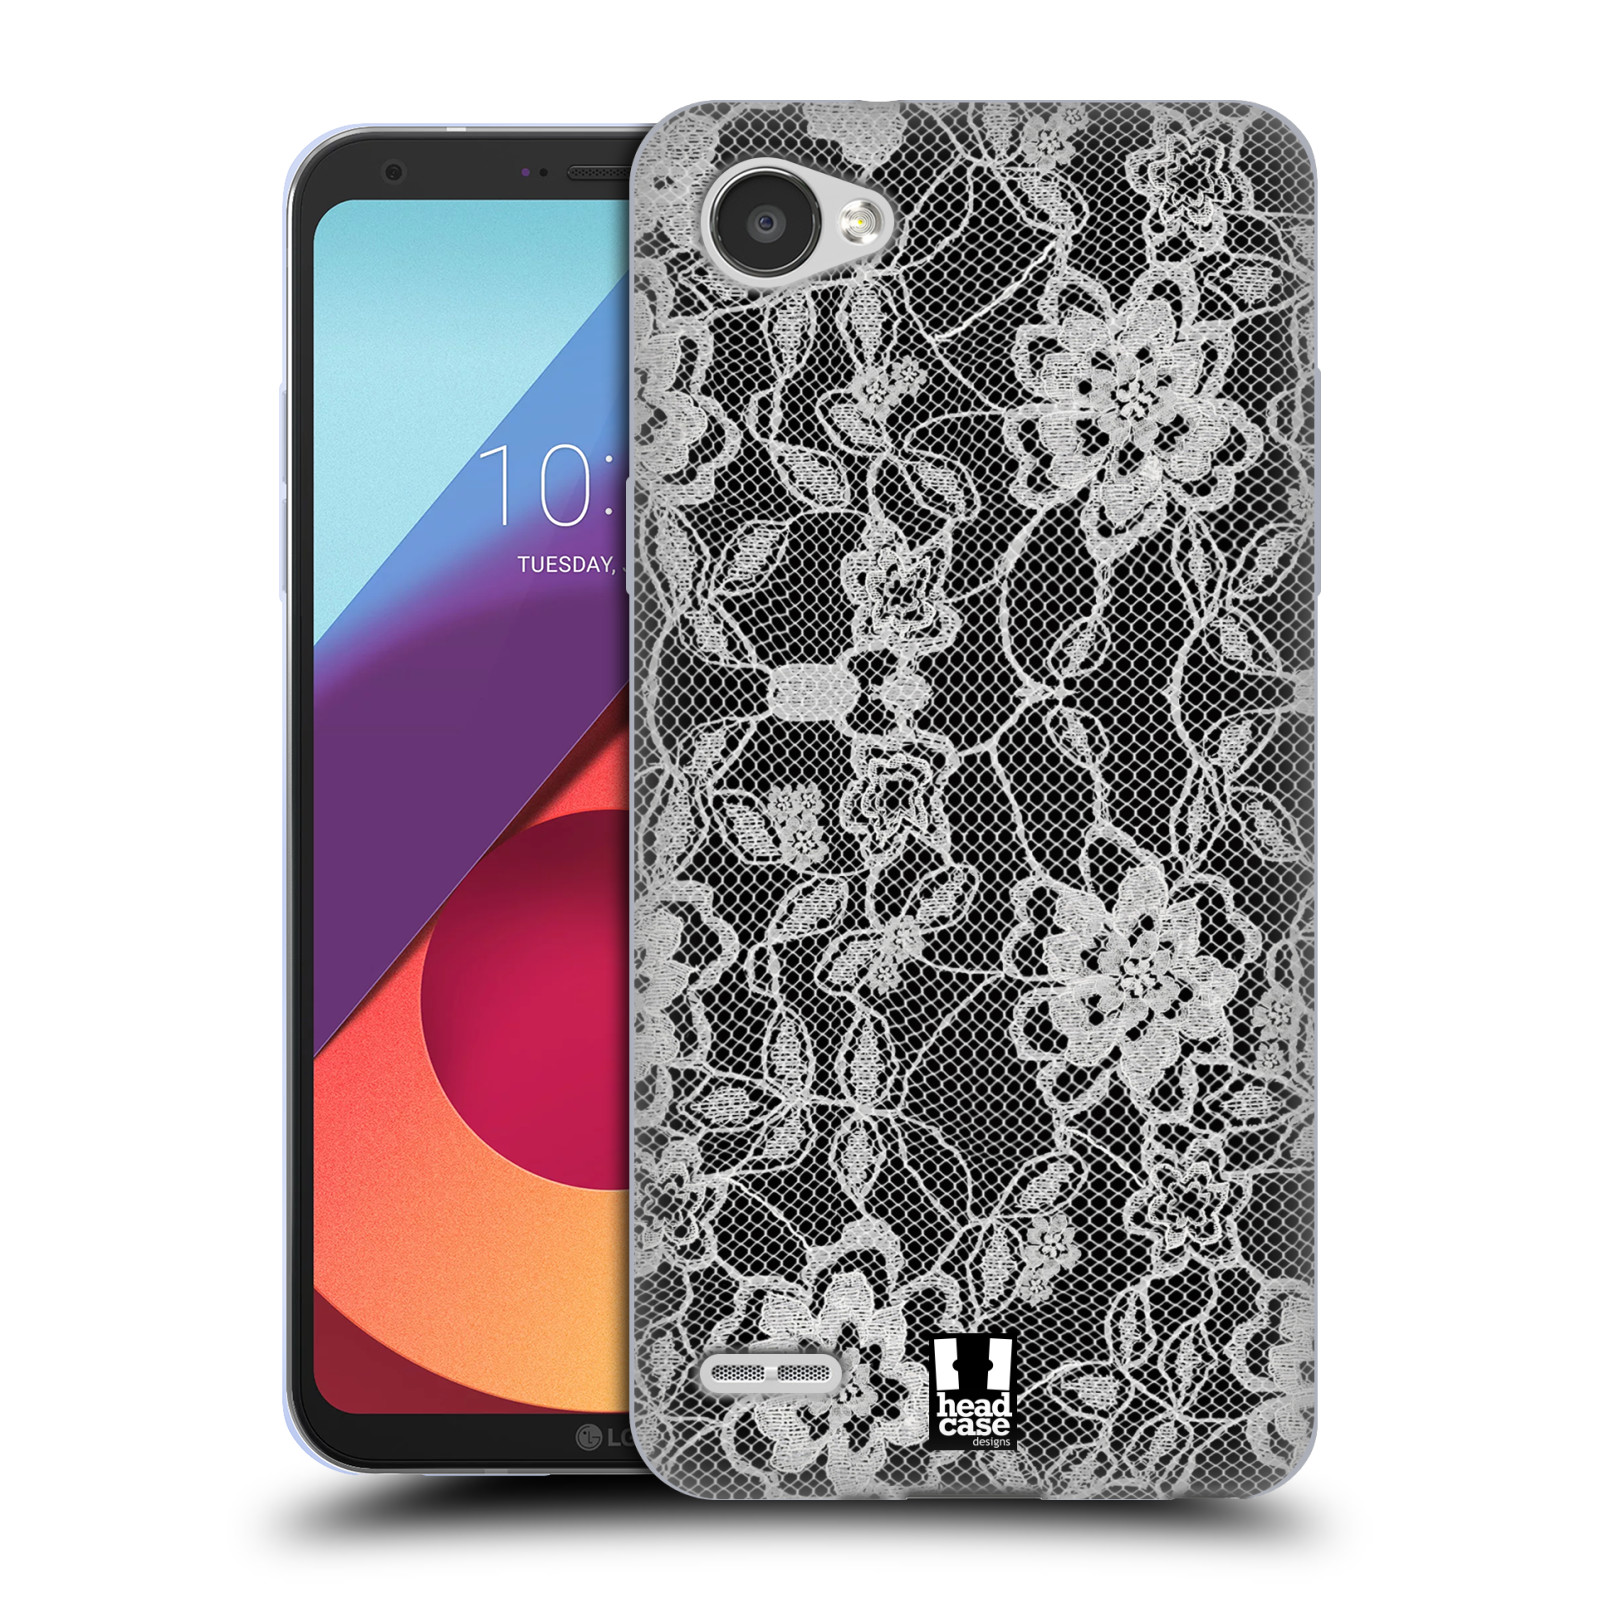 Silikonové pouzdro na mobil LG Q6 - Head Case - FLOWERY KRAJKA